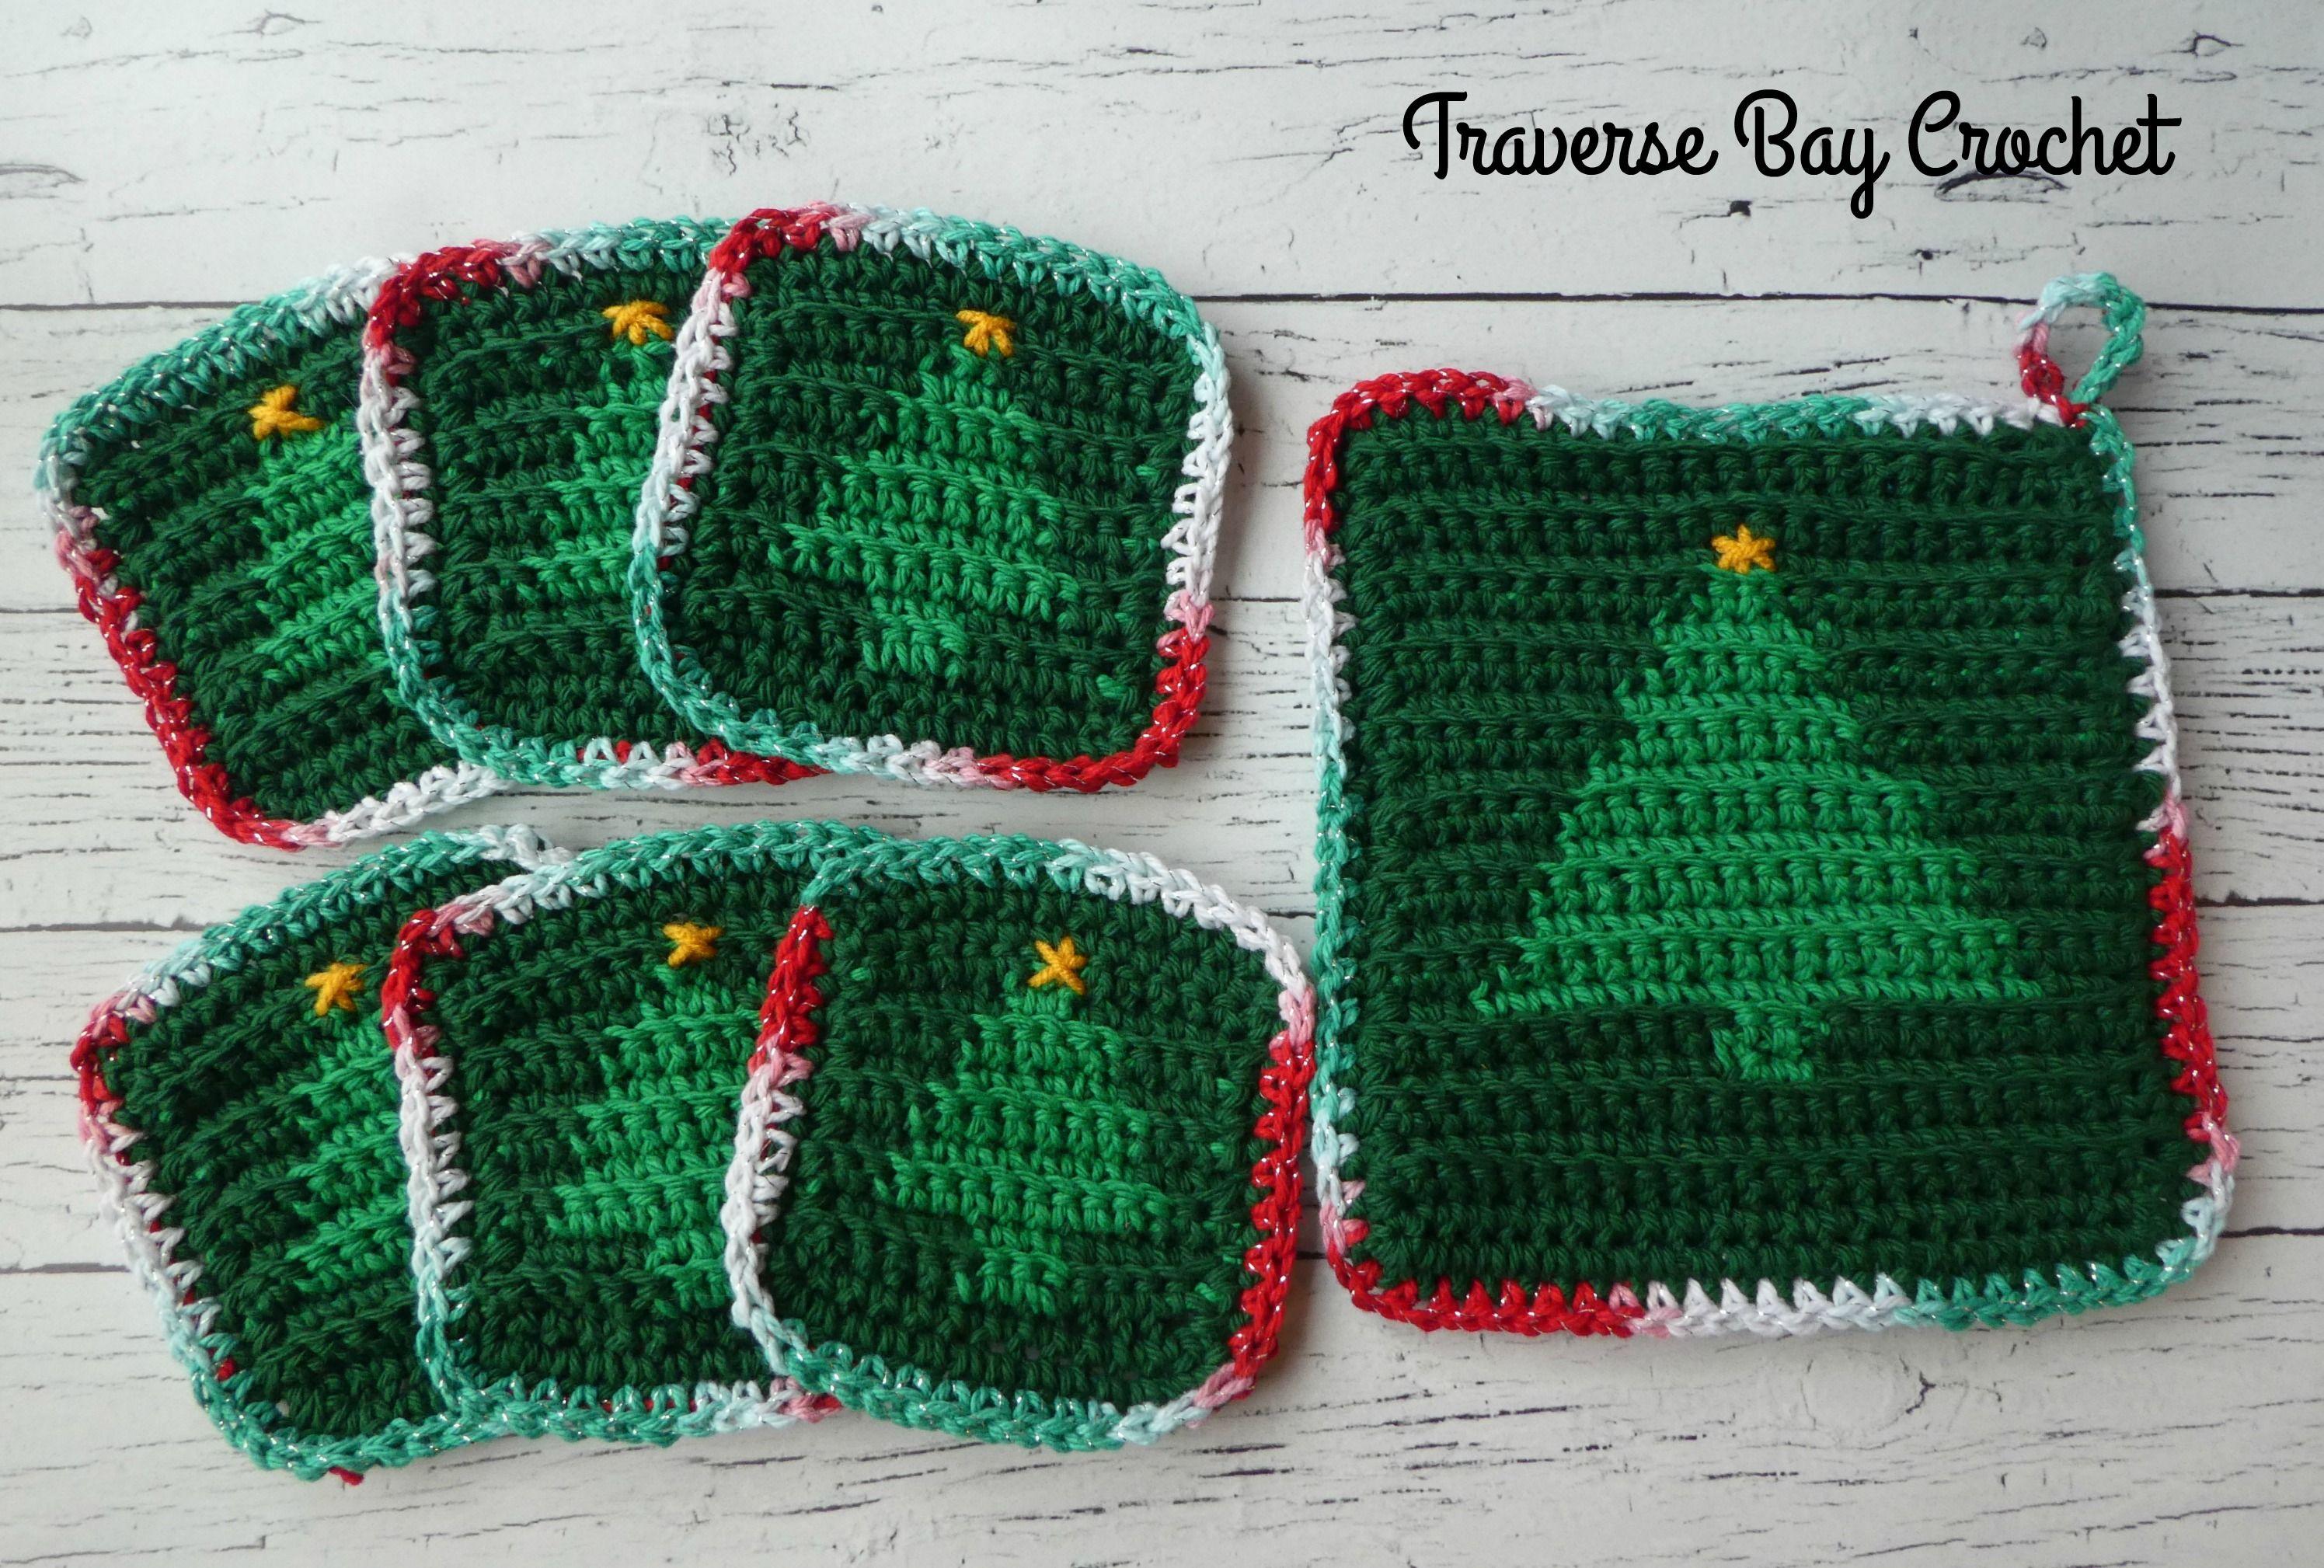 Crochet Christmas Tree Hotpad Coaster Set Traversebaycrochet Com Crochet Christmas Trees Christmas Coasters Christmas Crochet